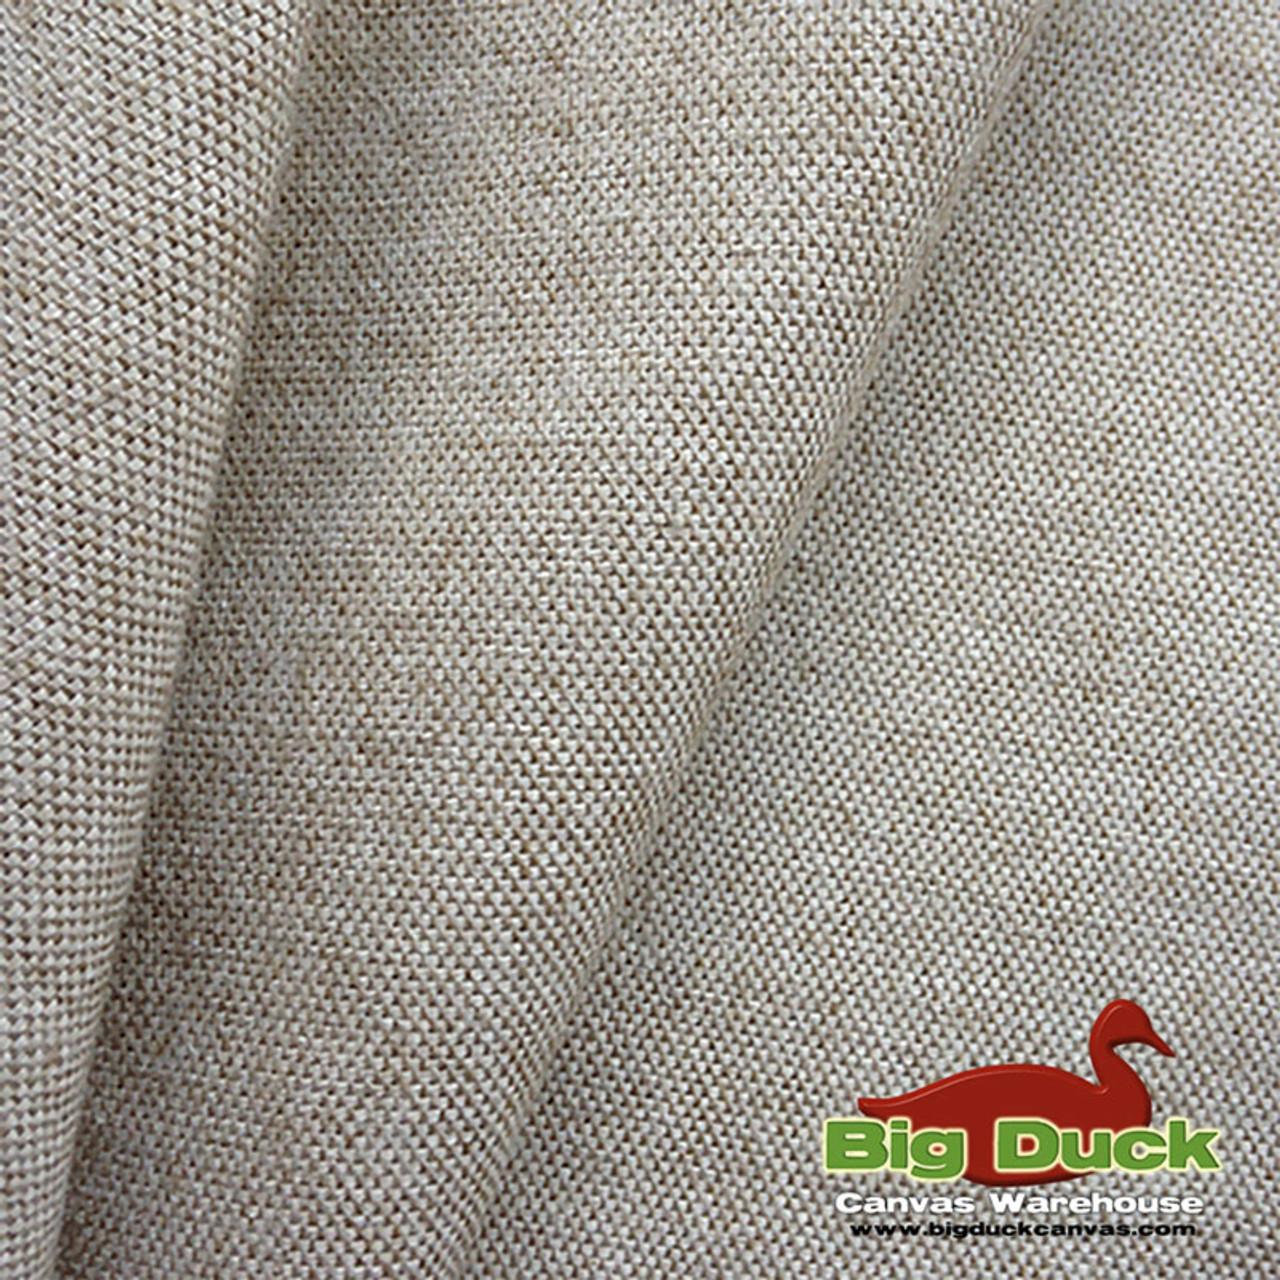 Oatmeal Basecloth Linen Upholstery Drapery Fabric 12oz Cotton